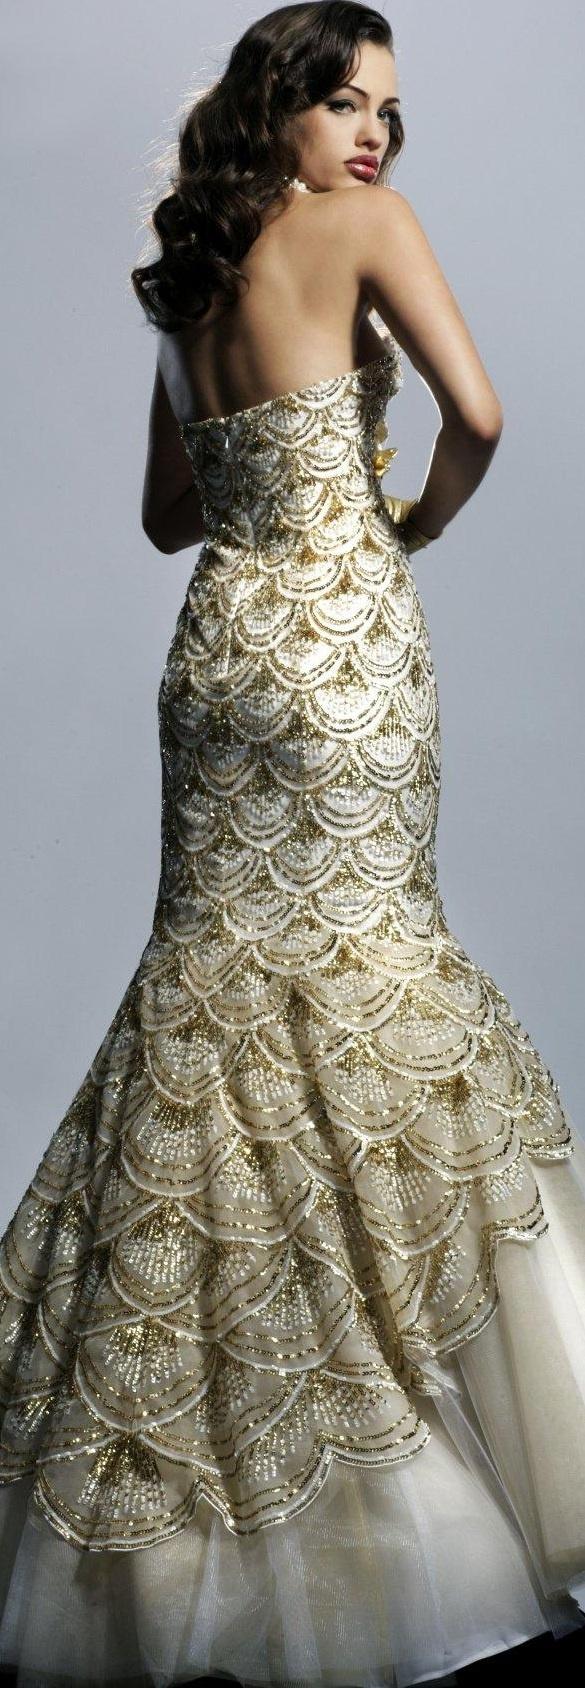 www.sherrihill.com, Sherri Hill couture 2013 ~  Bridal Collection, bride, bridal, wedding, noiva, عروس, زفاف, novia, sposa, כלה, abiti da sposa, vestidos de novia, vestidos de noiva, boda, casemento, mariage, matrimonio, wedding dress, wedding gown